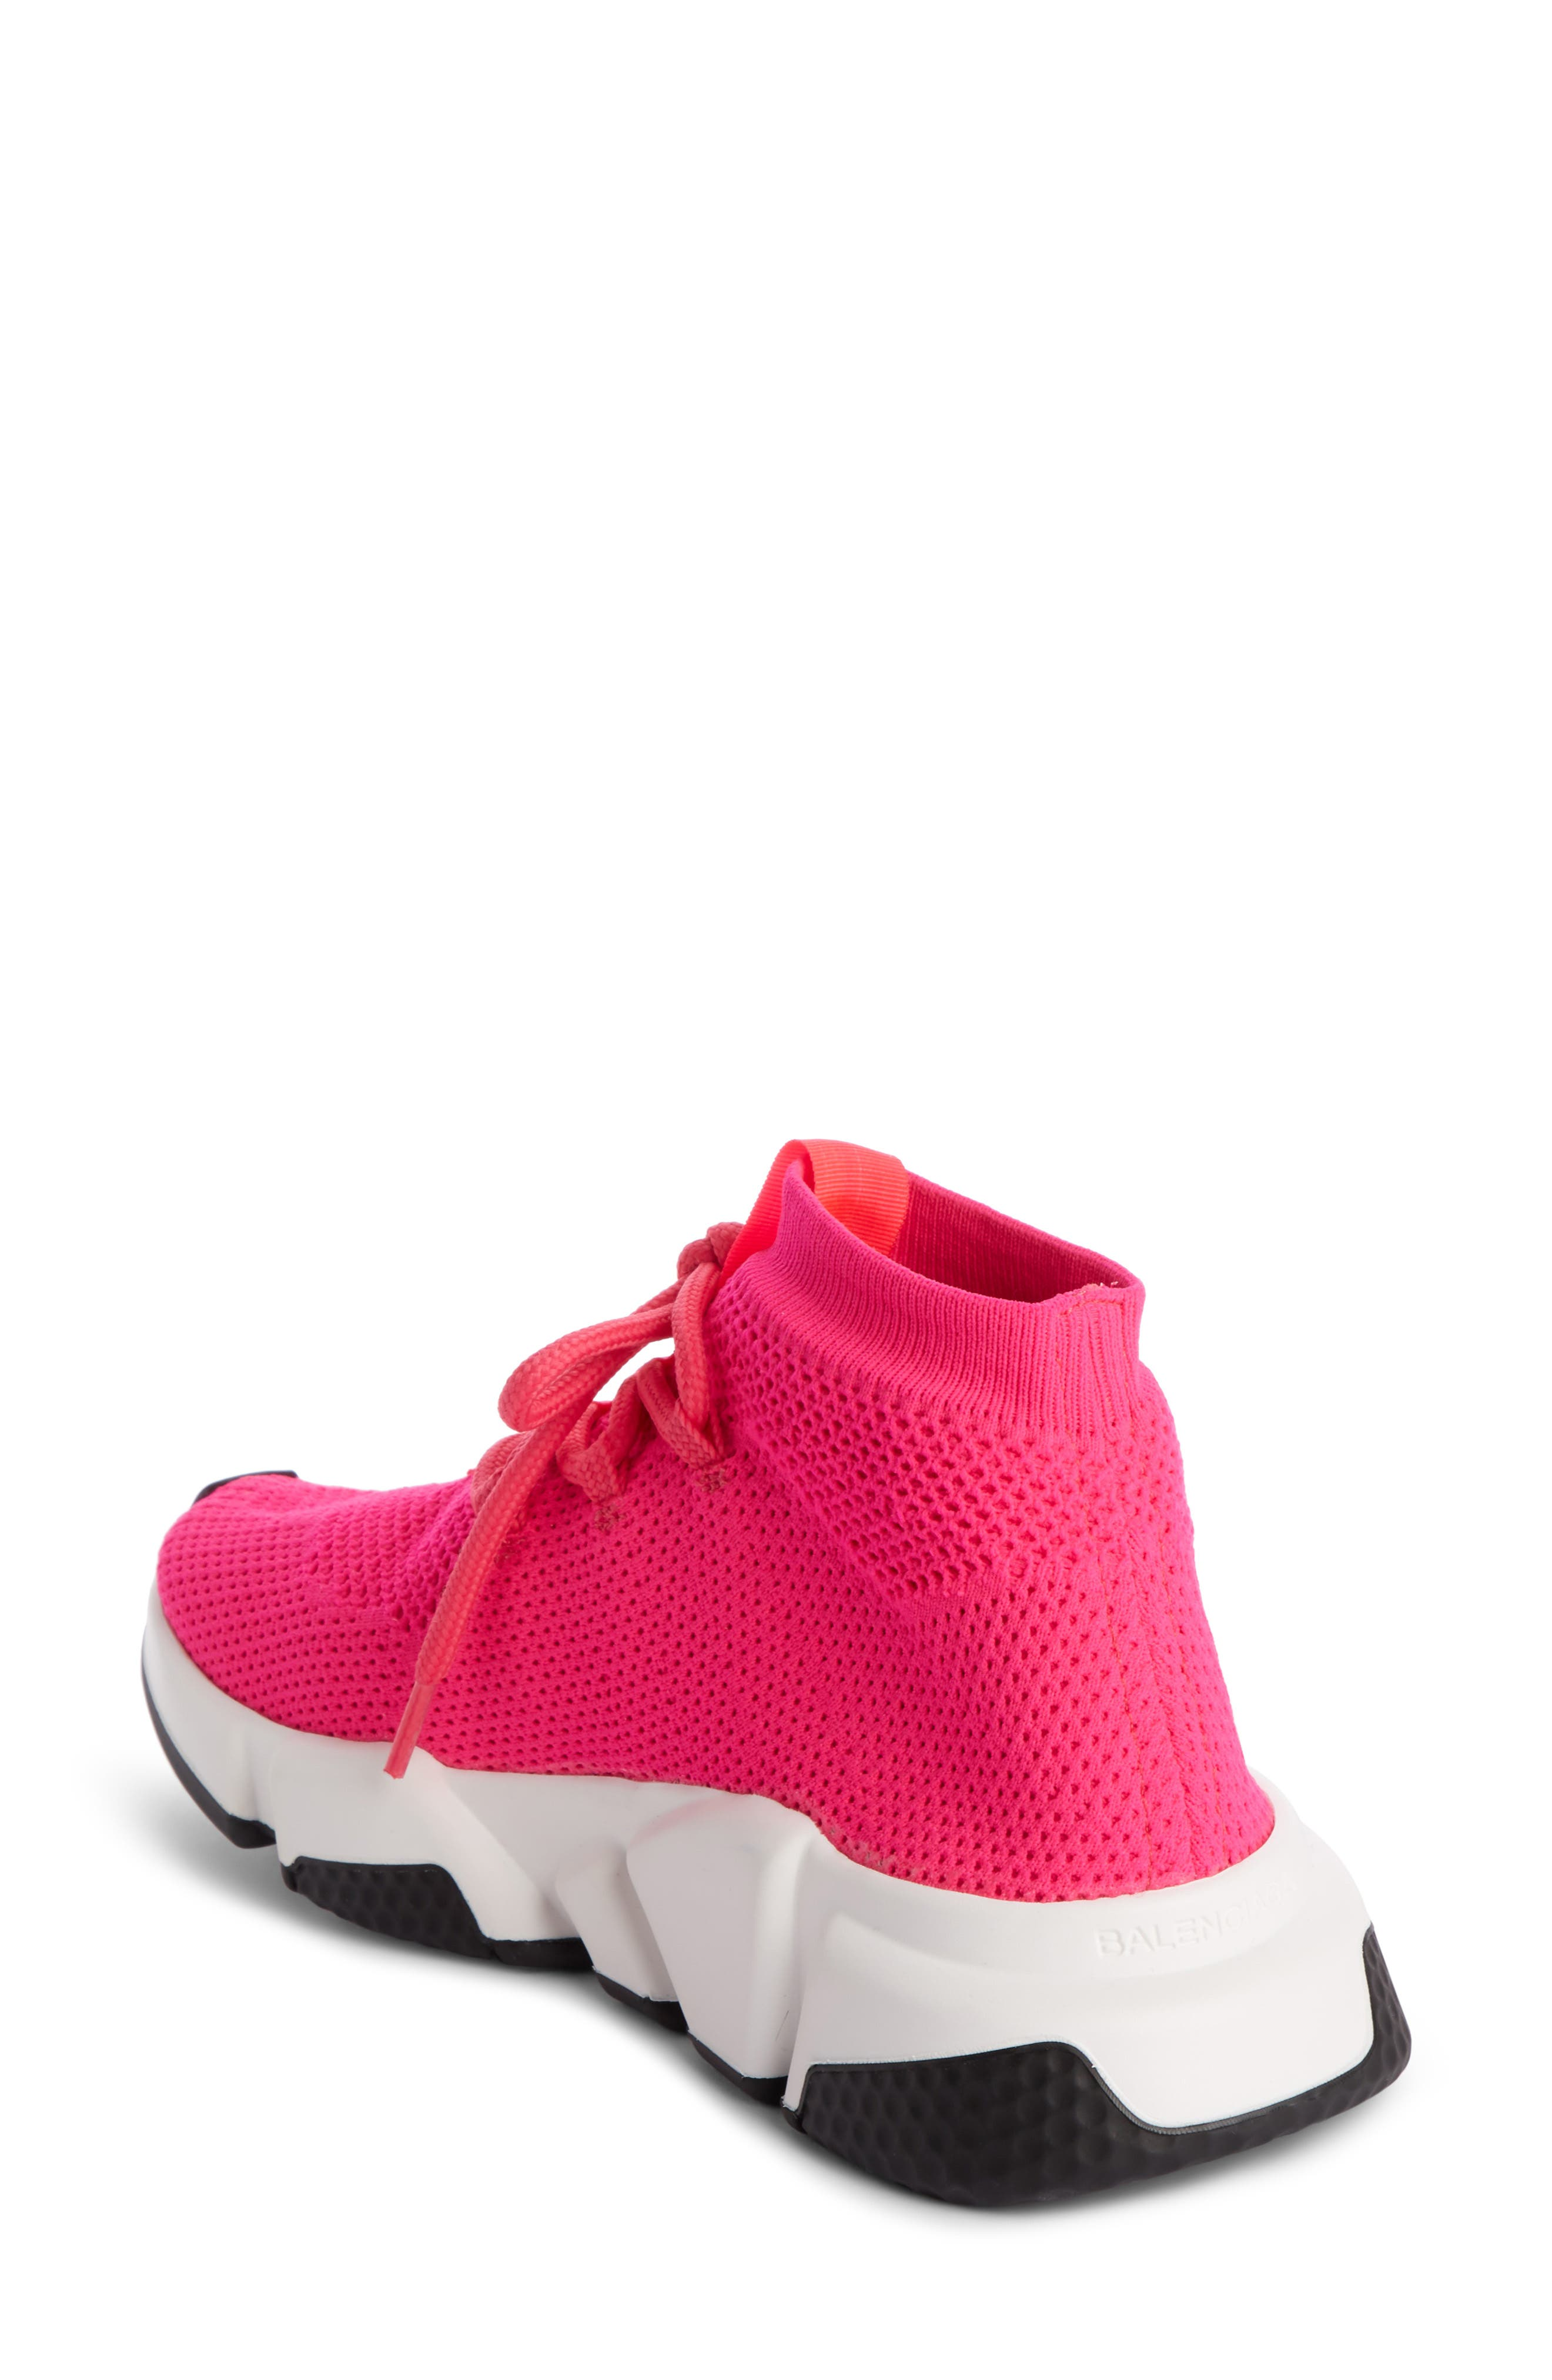 e8d40d85efaf Women s Balenciaga Shoes